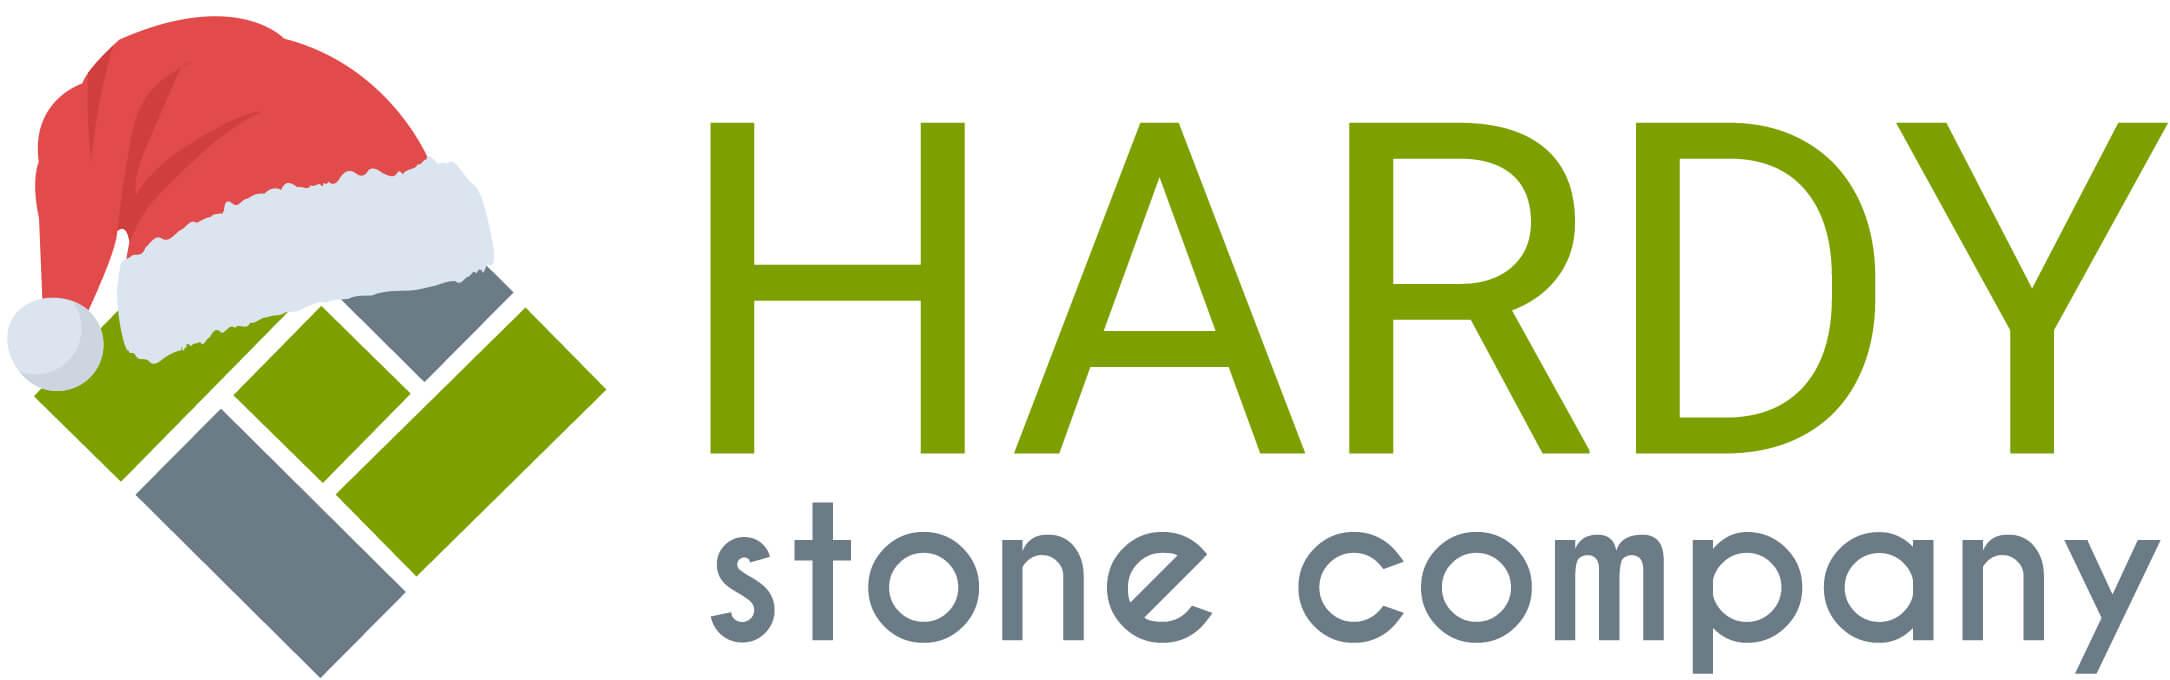 Hardy-Stone-Company-Christmas-Logo